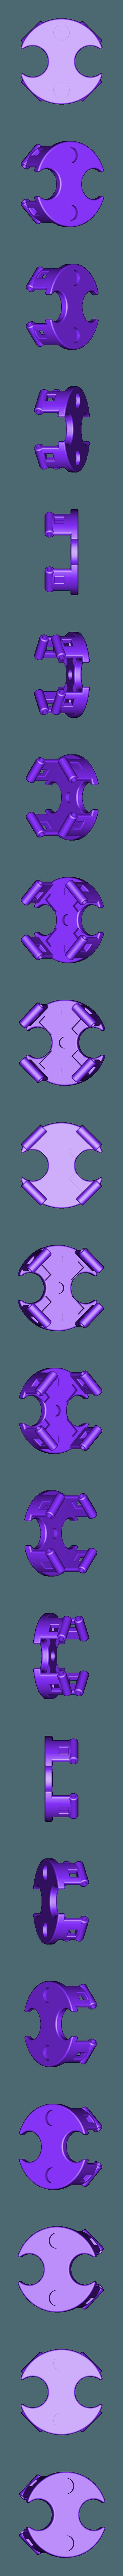 top-body.stl Download free STL file Mechnolia • 3D printing template, ChrisBobo